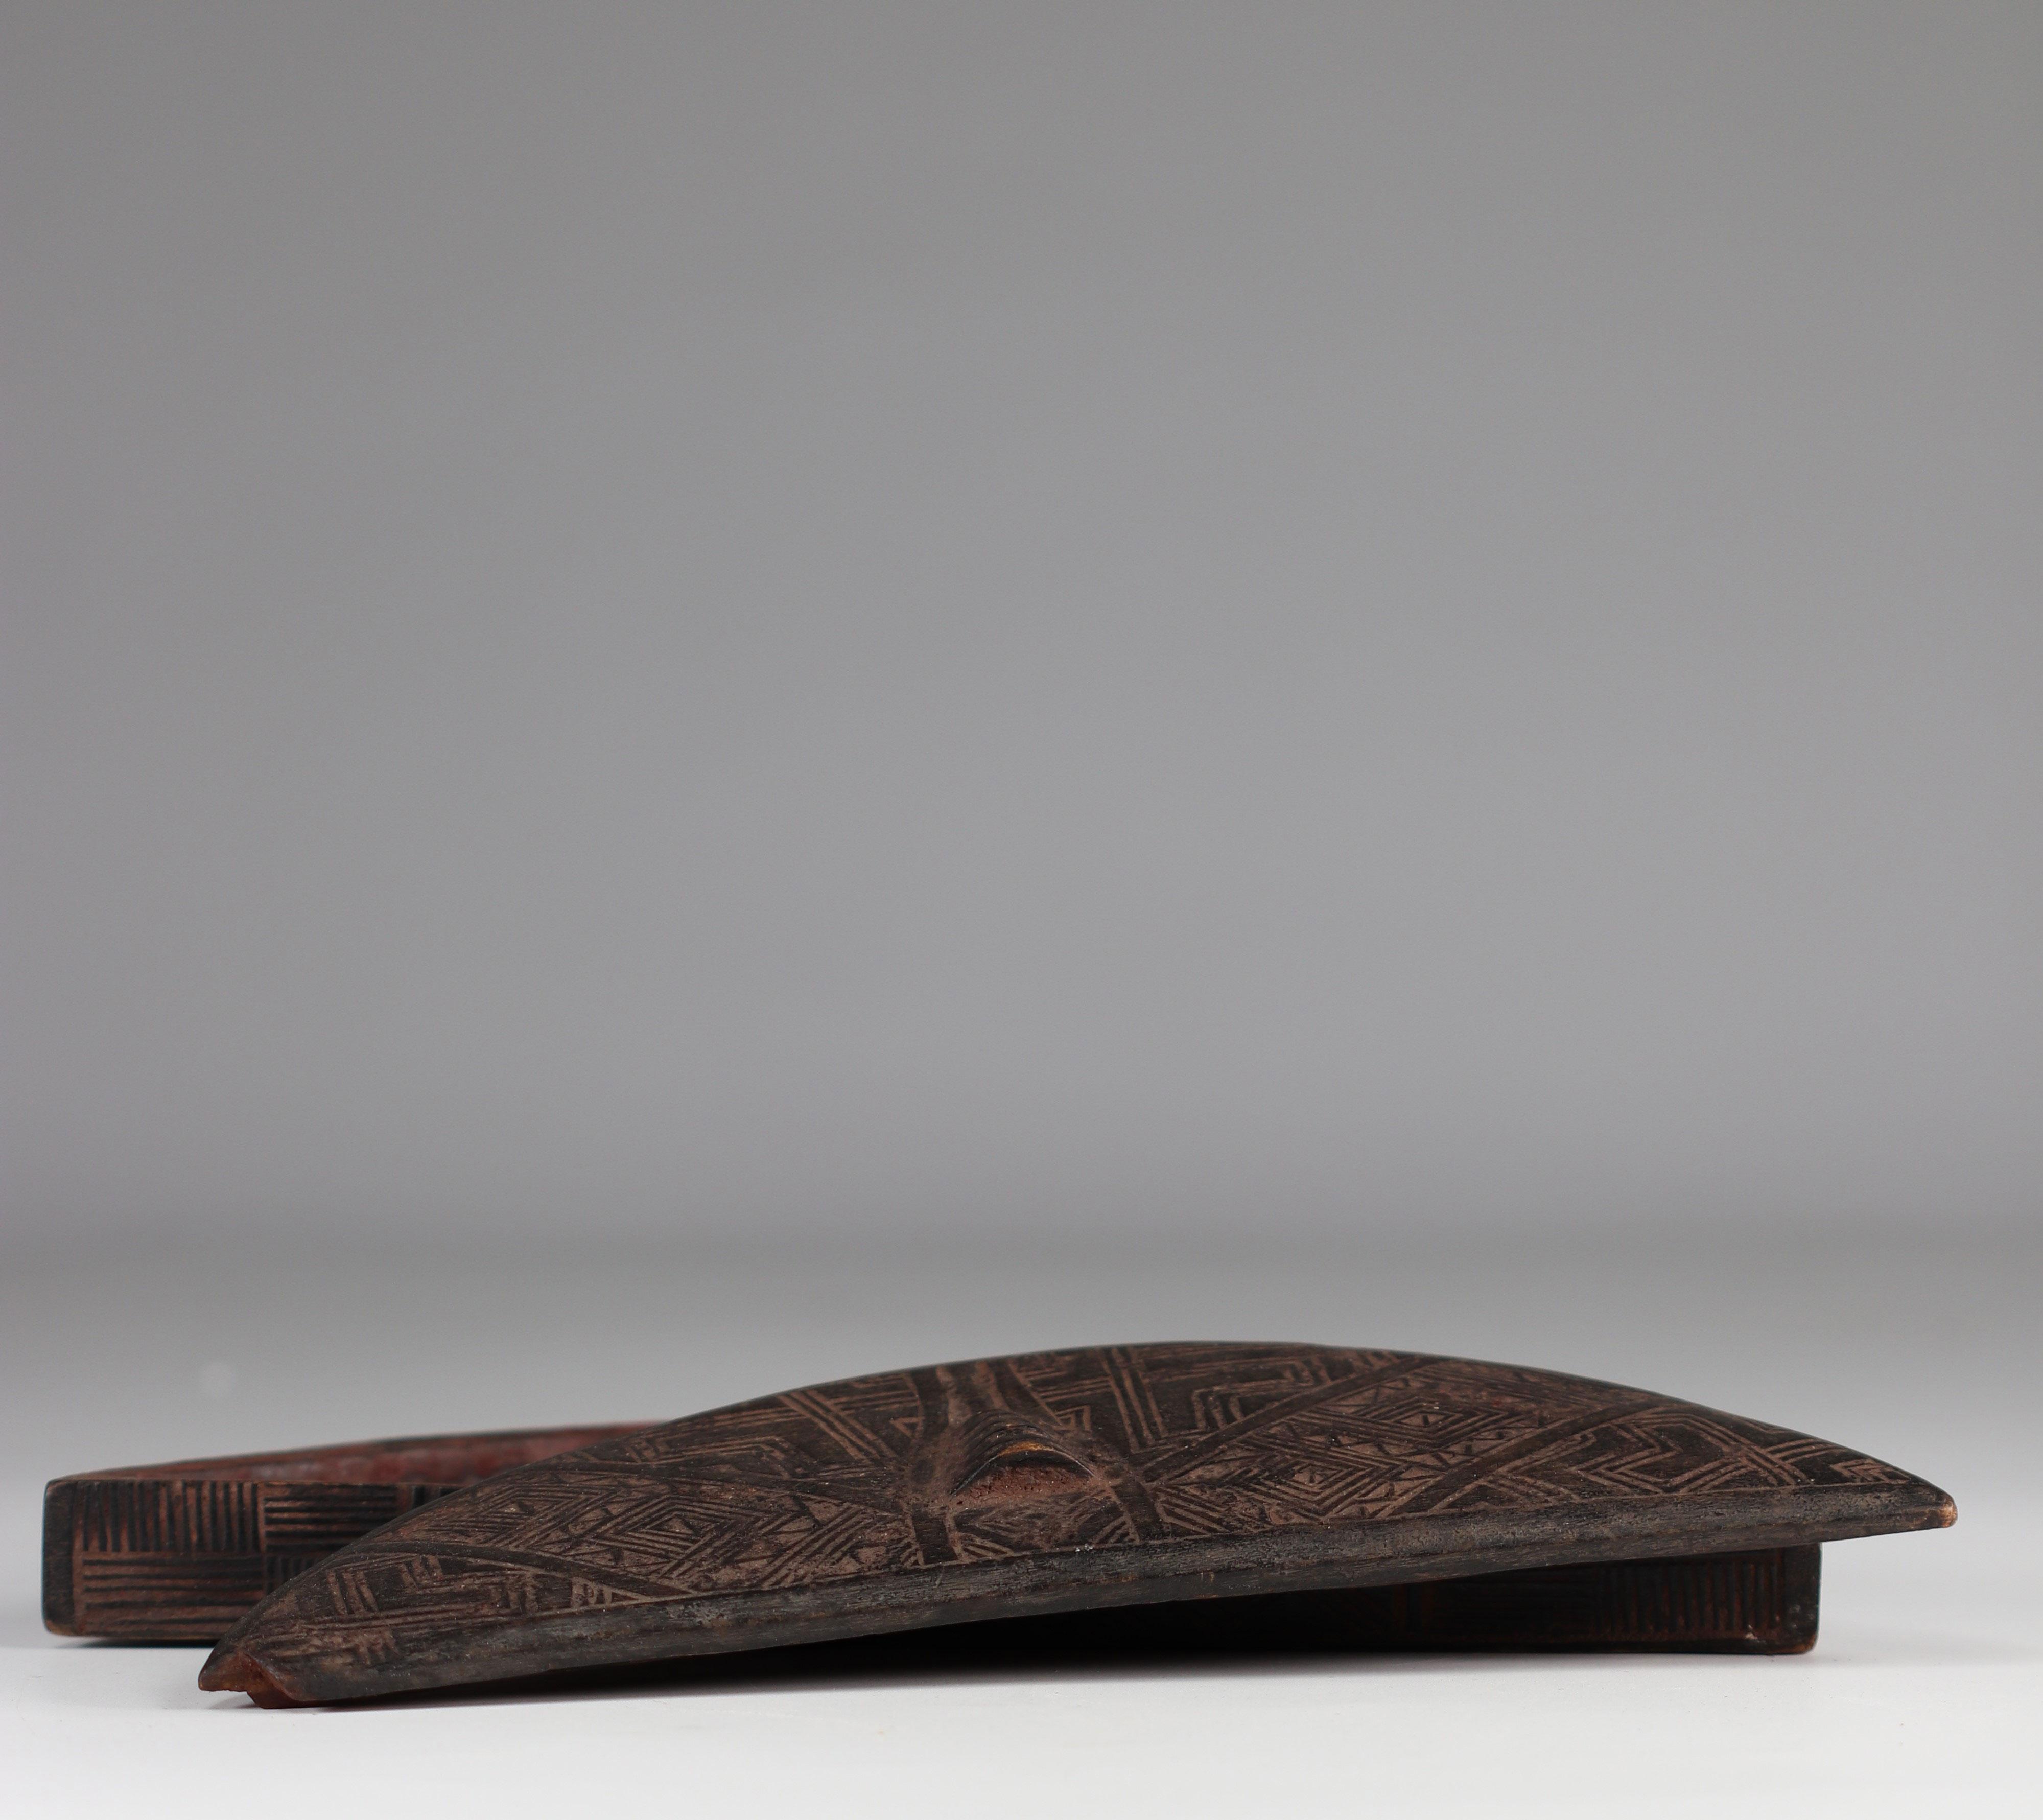 Beautiful Kuba tukula box - beautiful patina of use - early 20th century old P.d'Artevelle collectio - Image 2 of 3